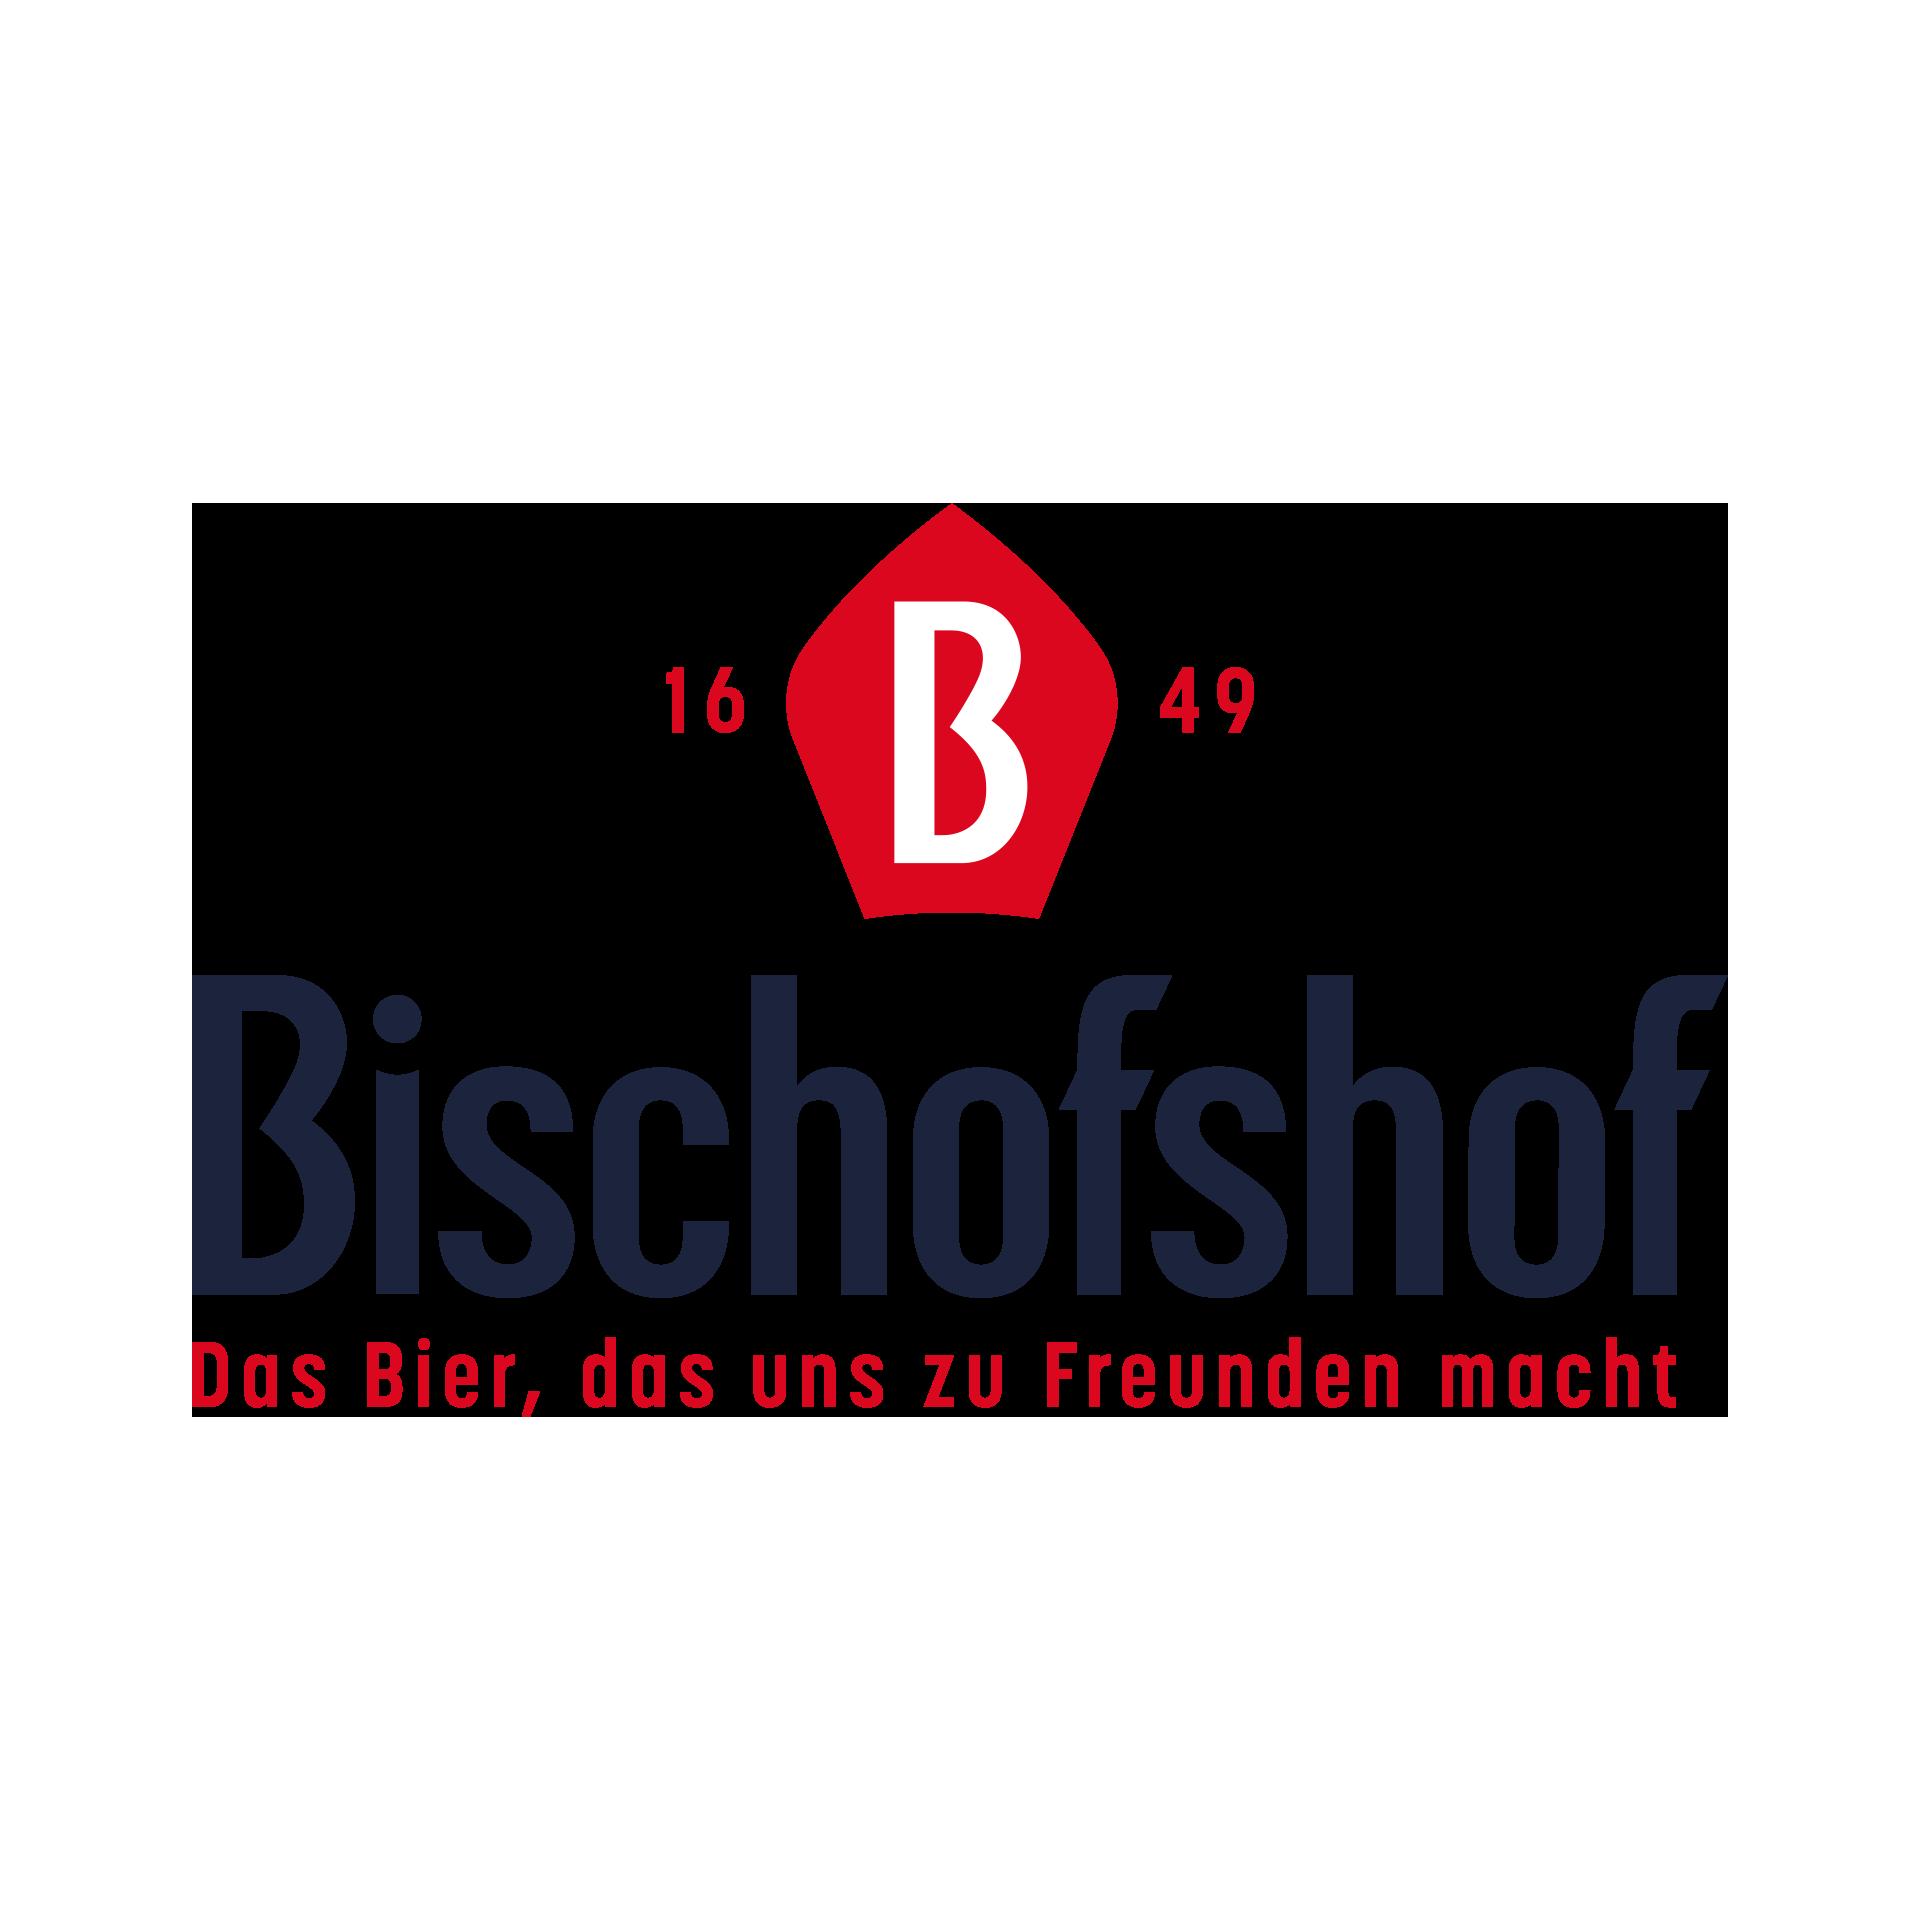 Bischofshof-Markenschriftzug-4c-transparent_01